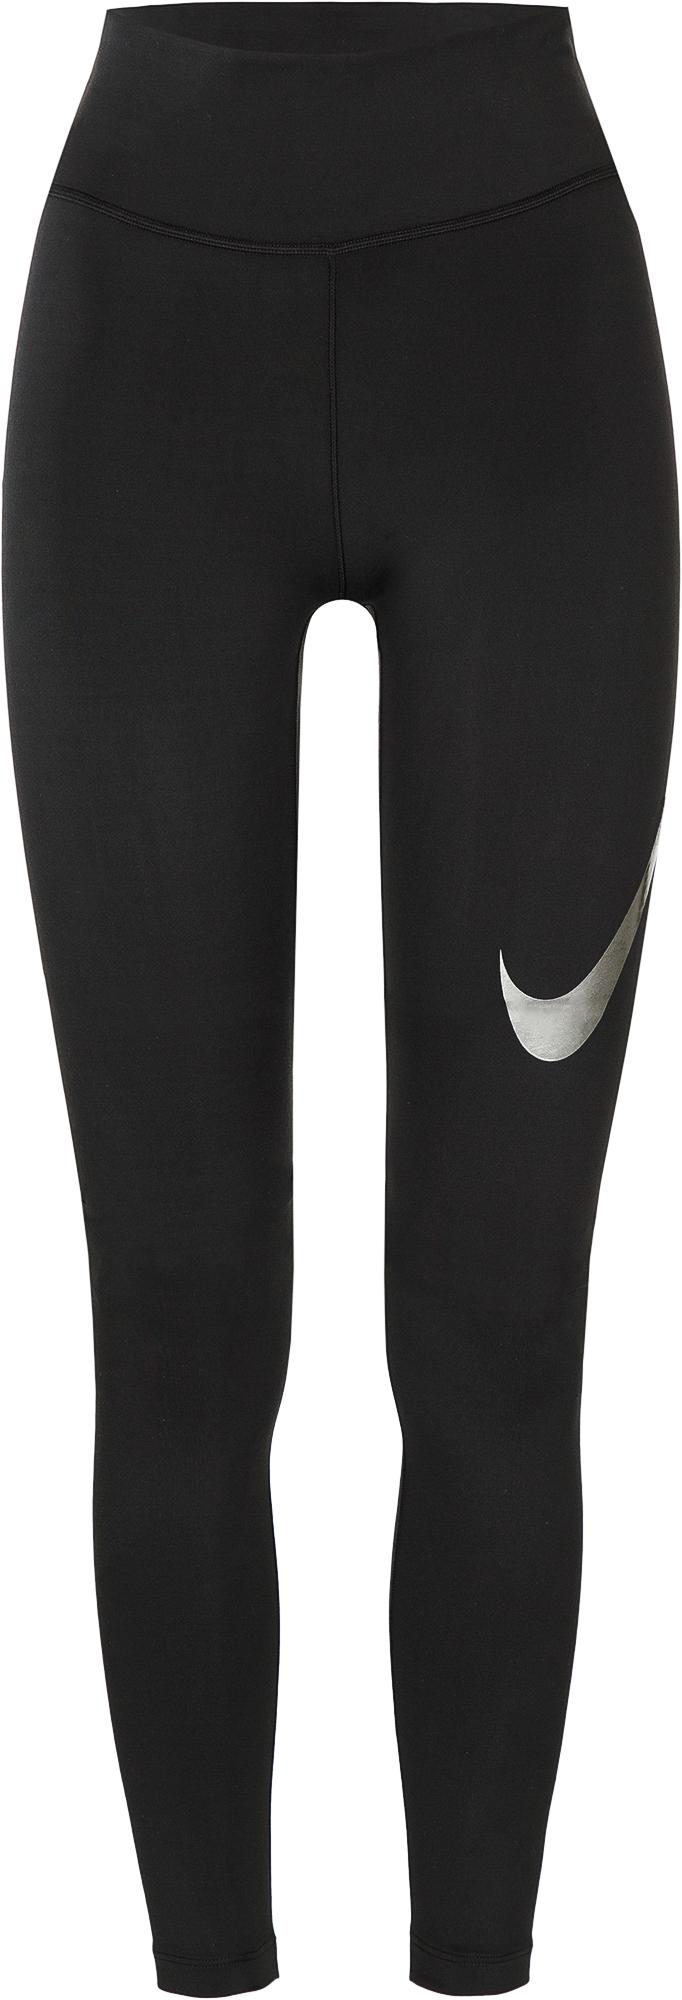 Nike Легинсы женские Nike All-In, размер 46-48